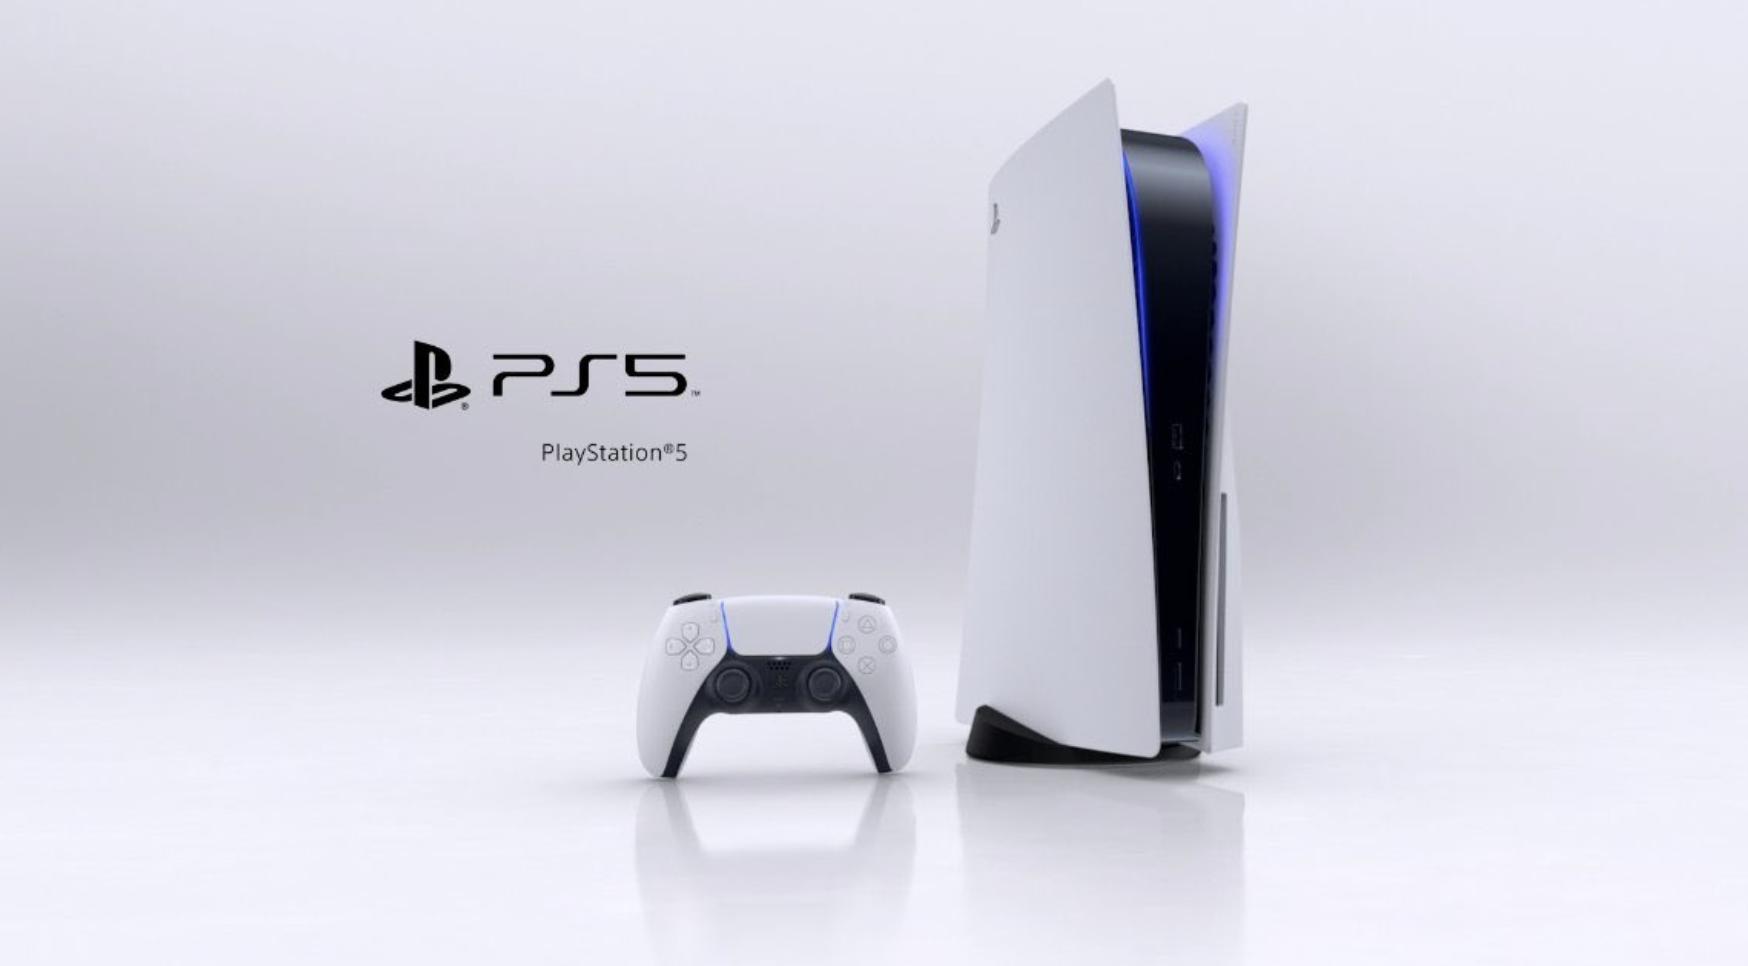 Hal Menarik Dari PlayStation5 Yang Menjadikannya Hot Item!